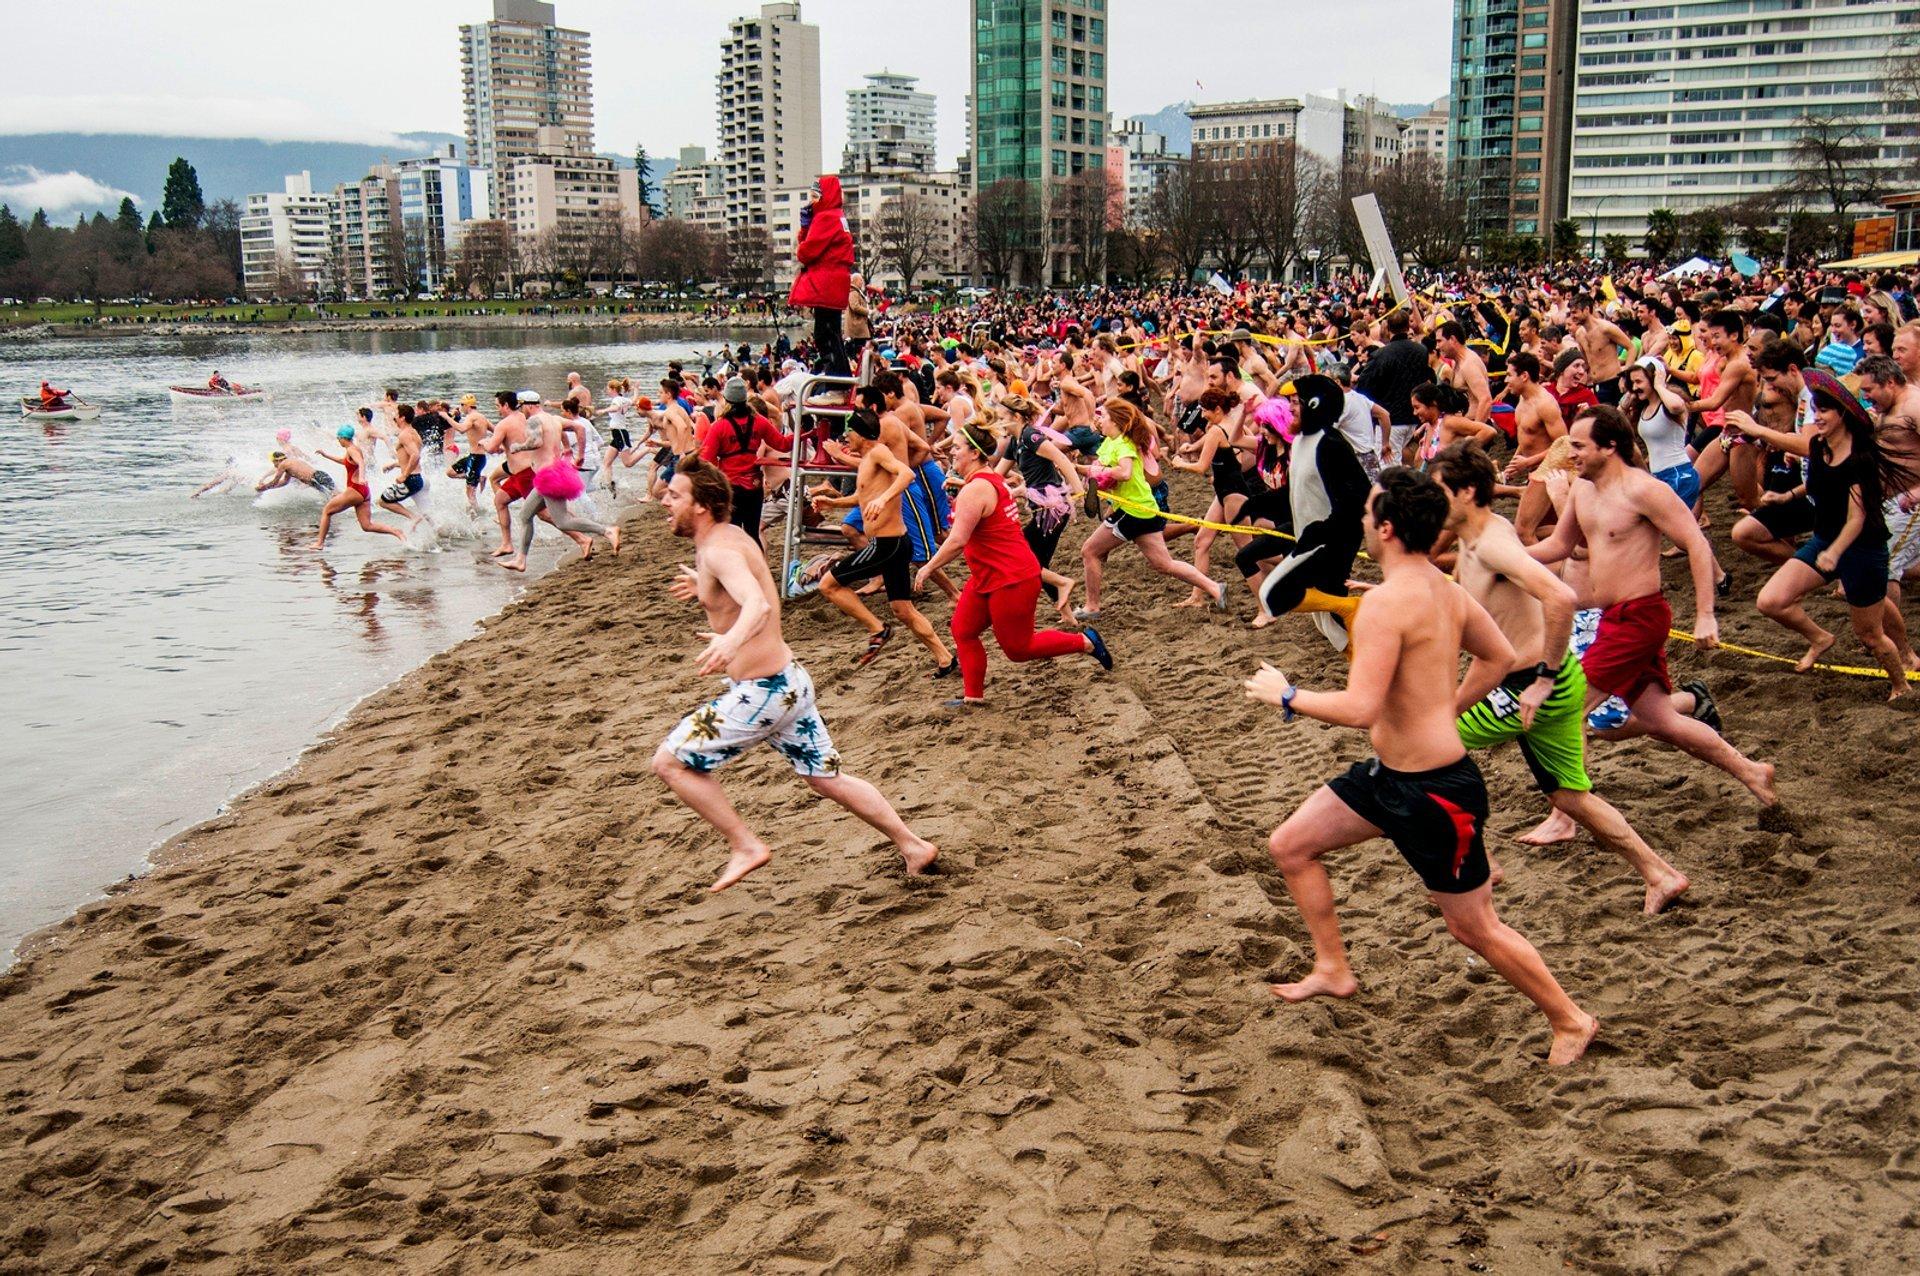 Polar Bear Swim in Vancouver 2019 - Best Time